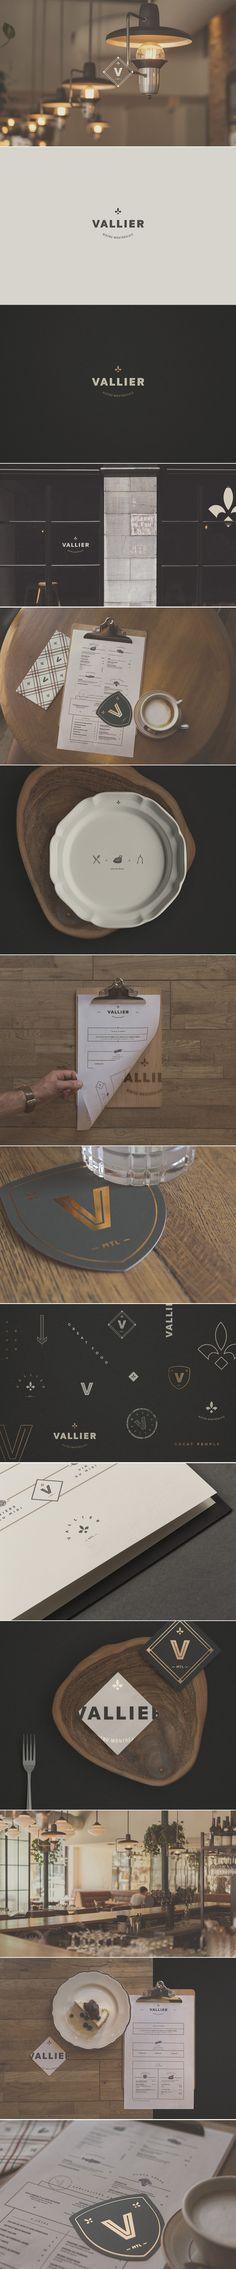 Vallier Bistro Branding by Phoenix the Creative Studio | Fivestar Branding Agency – Design and Branding Agency & Curated Inspiration Gallery #bistro #bistrobranding #restaurantbranding #branding #design #coasters #logo #logomark #design #behance #pinterest #dribbble #fivestarbranding